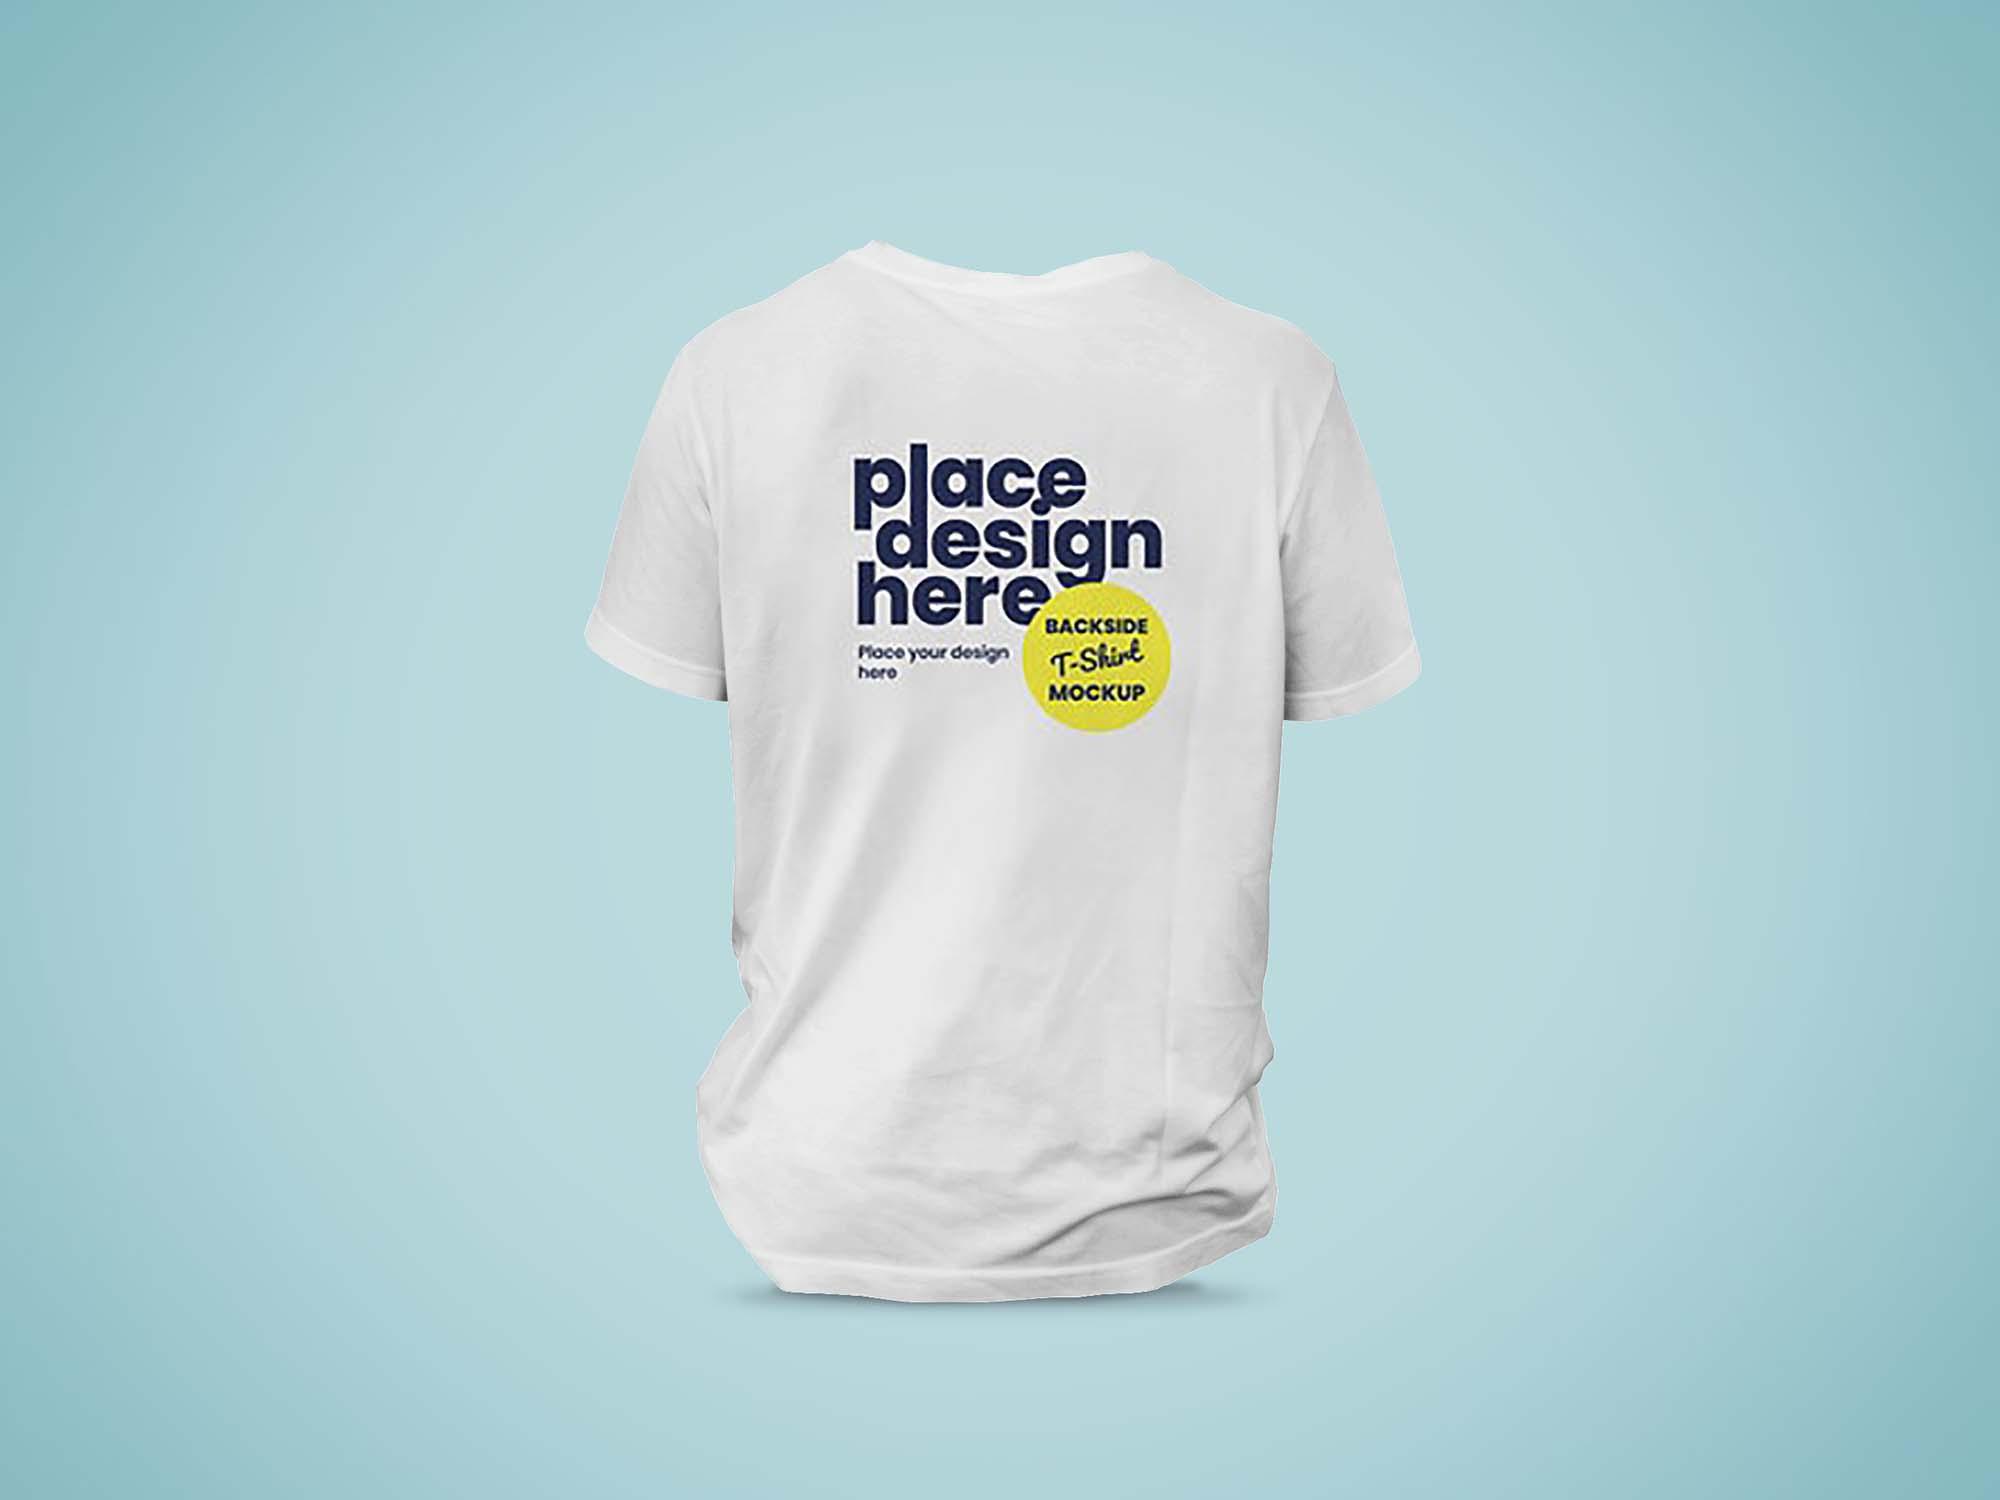 Backside T-Shirt Mockup